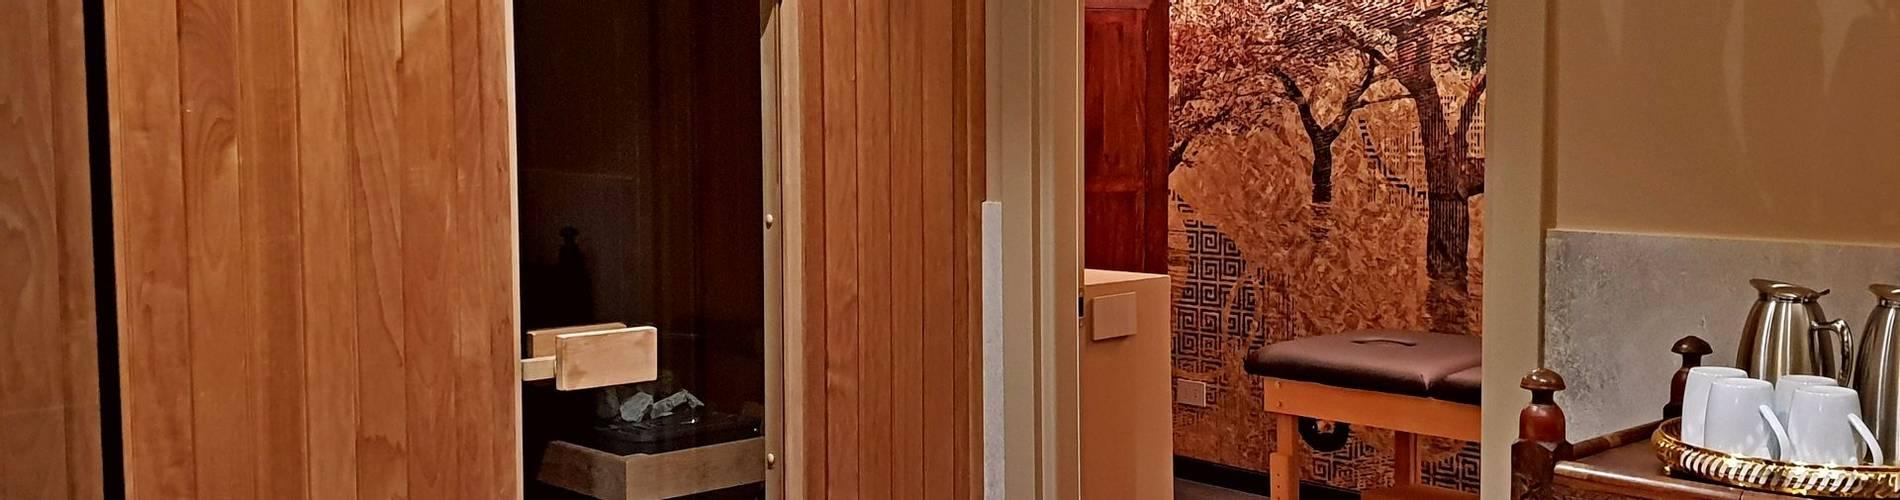 Sauna + mass.jpg